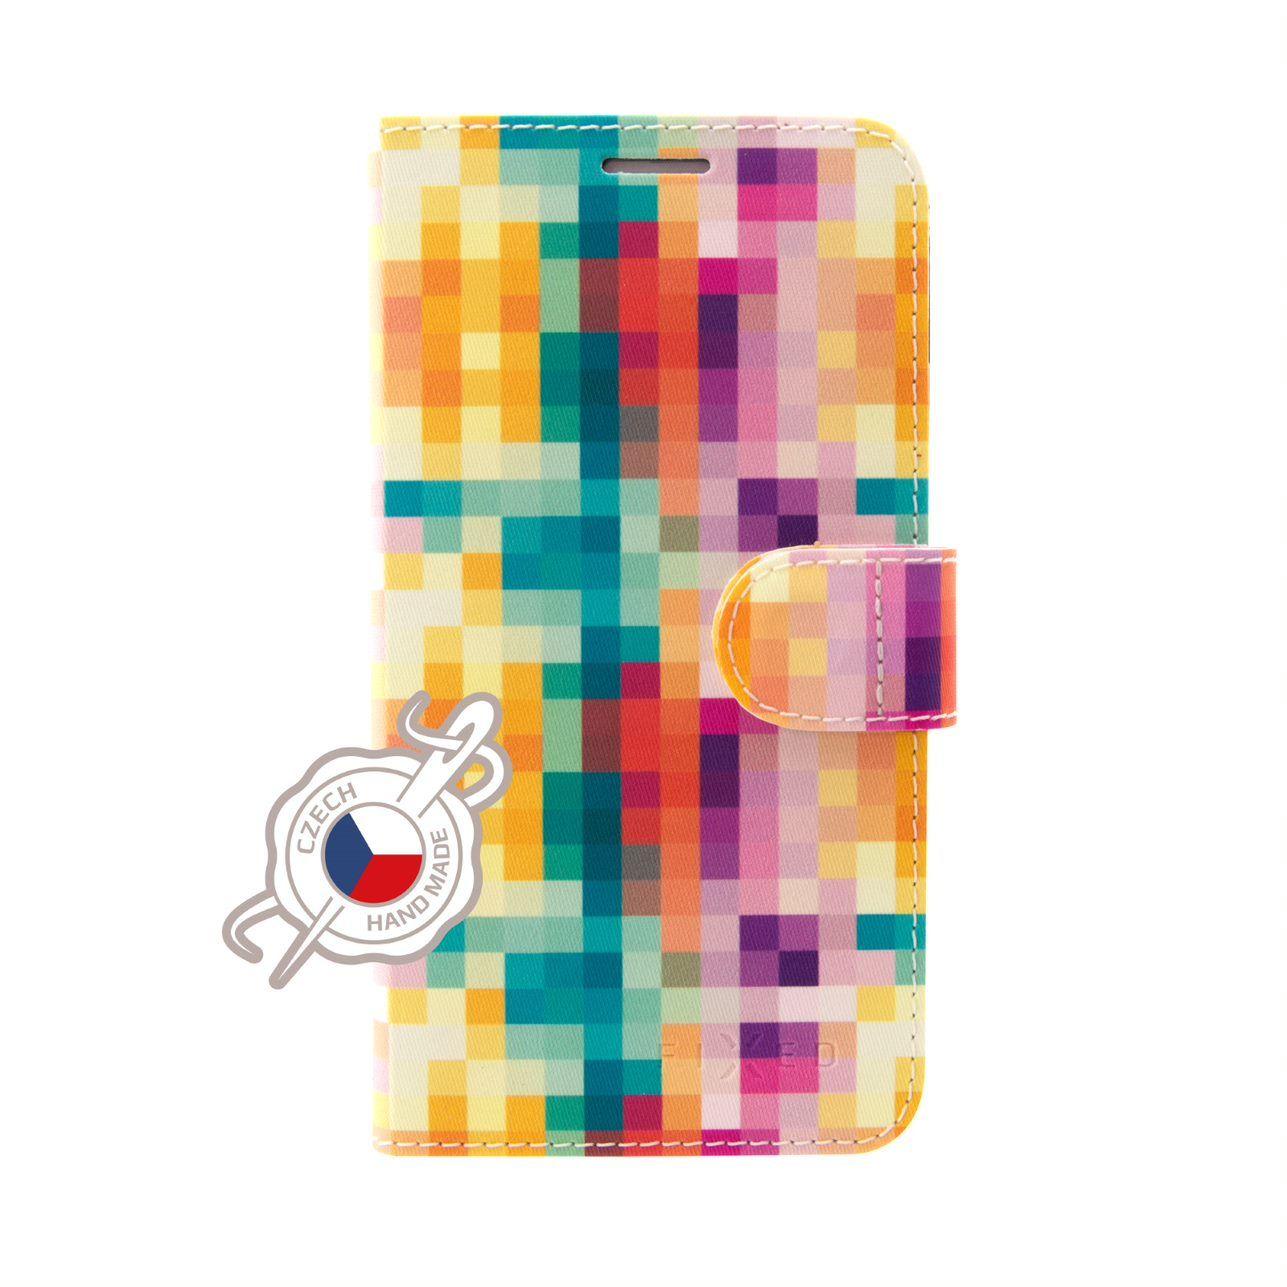 FIXED FIT flipové pouzdro pro Samsung Galaxy A40, motiv Dice